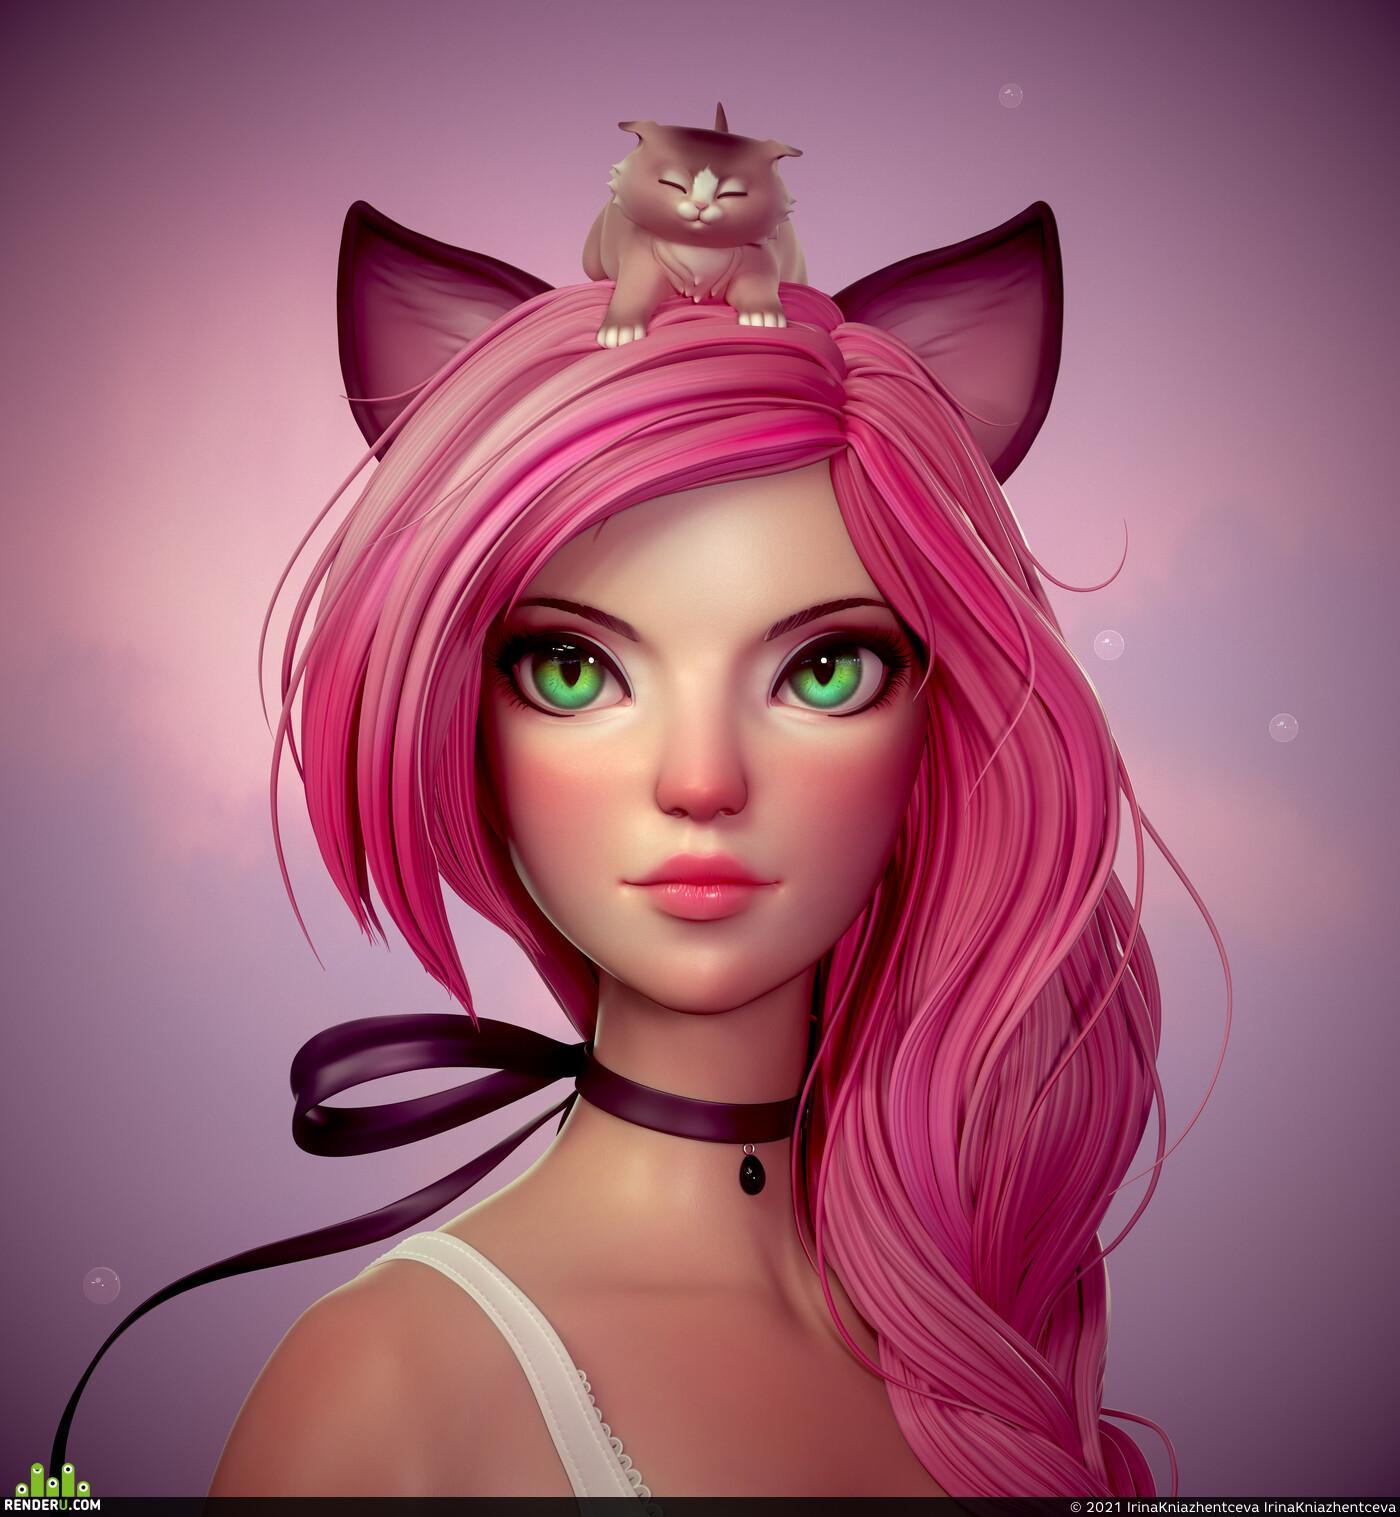 3dgirl, girl, Animals, Animalism, girlportrait